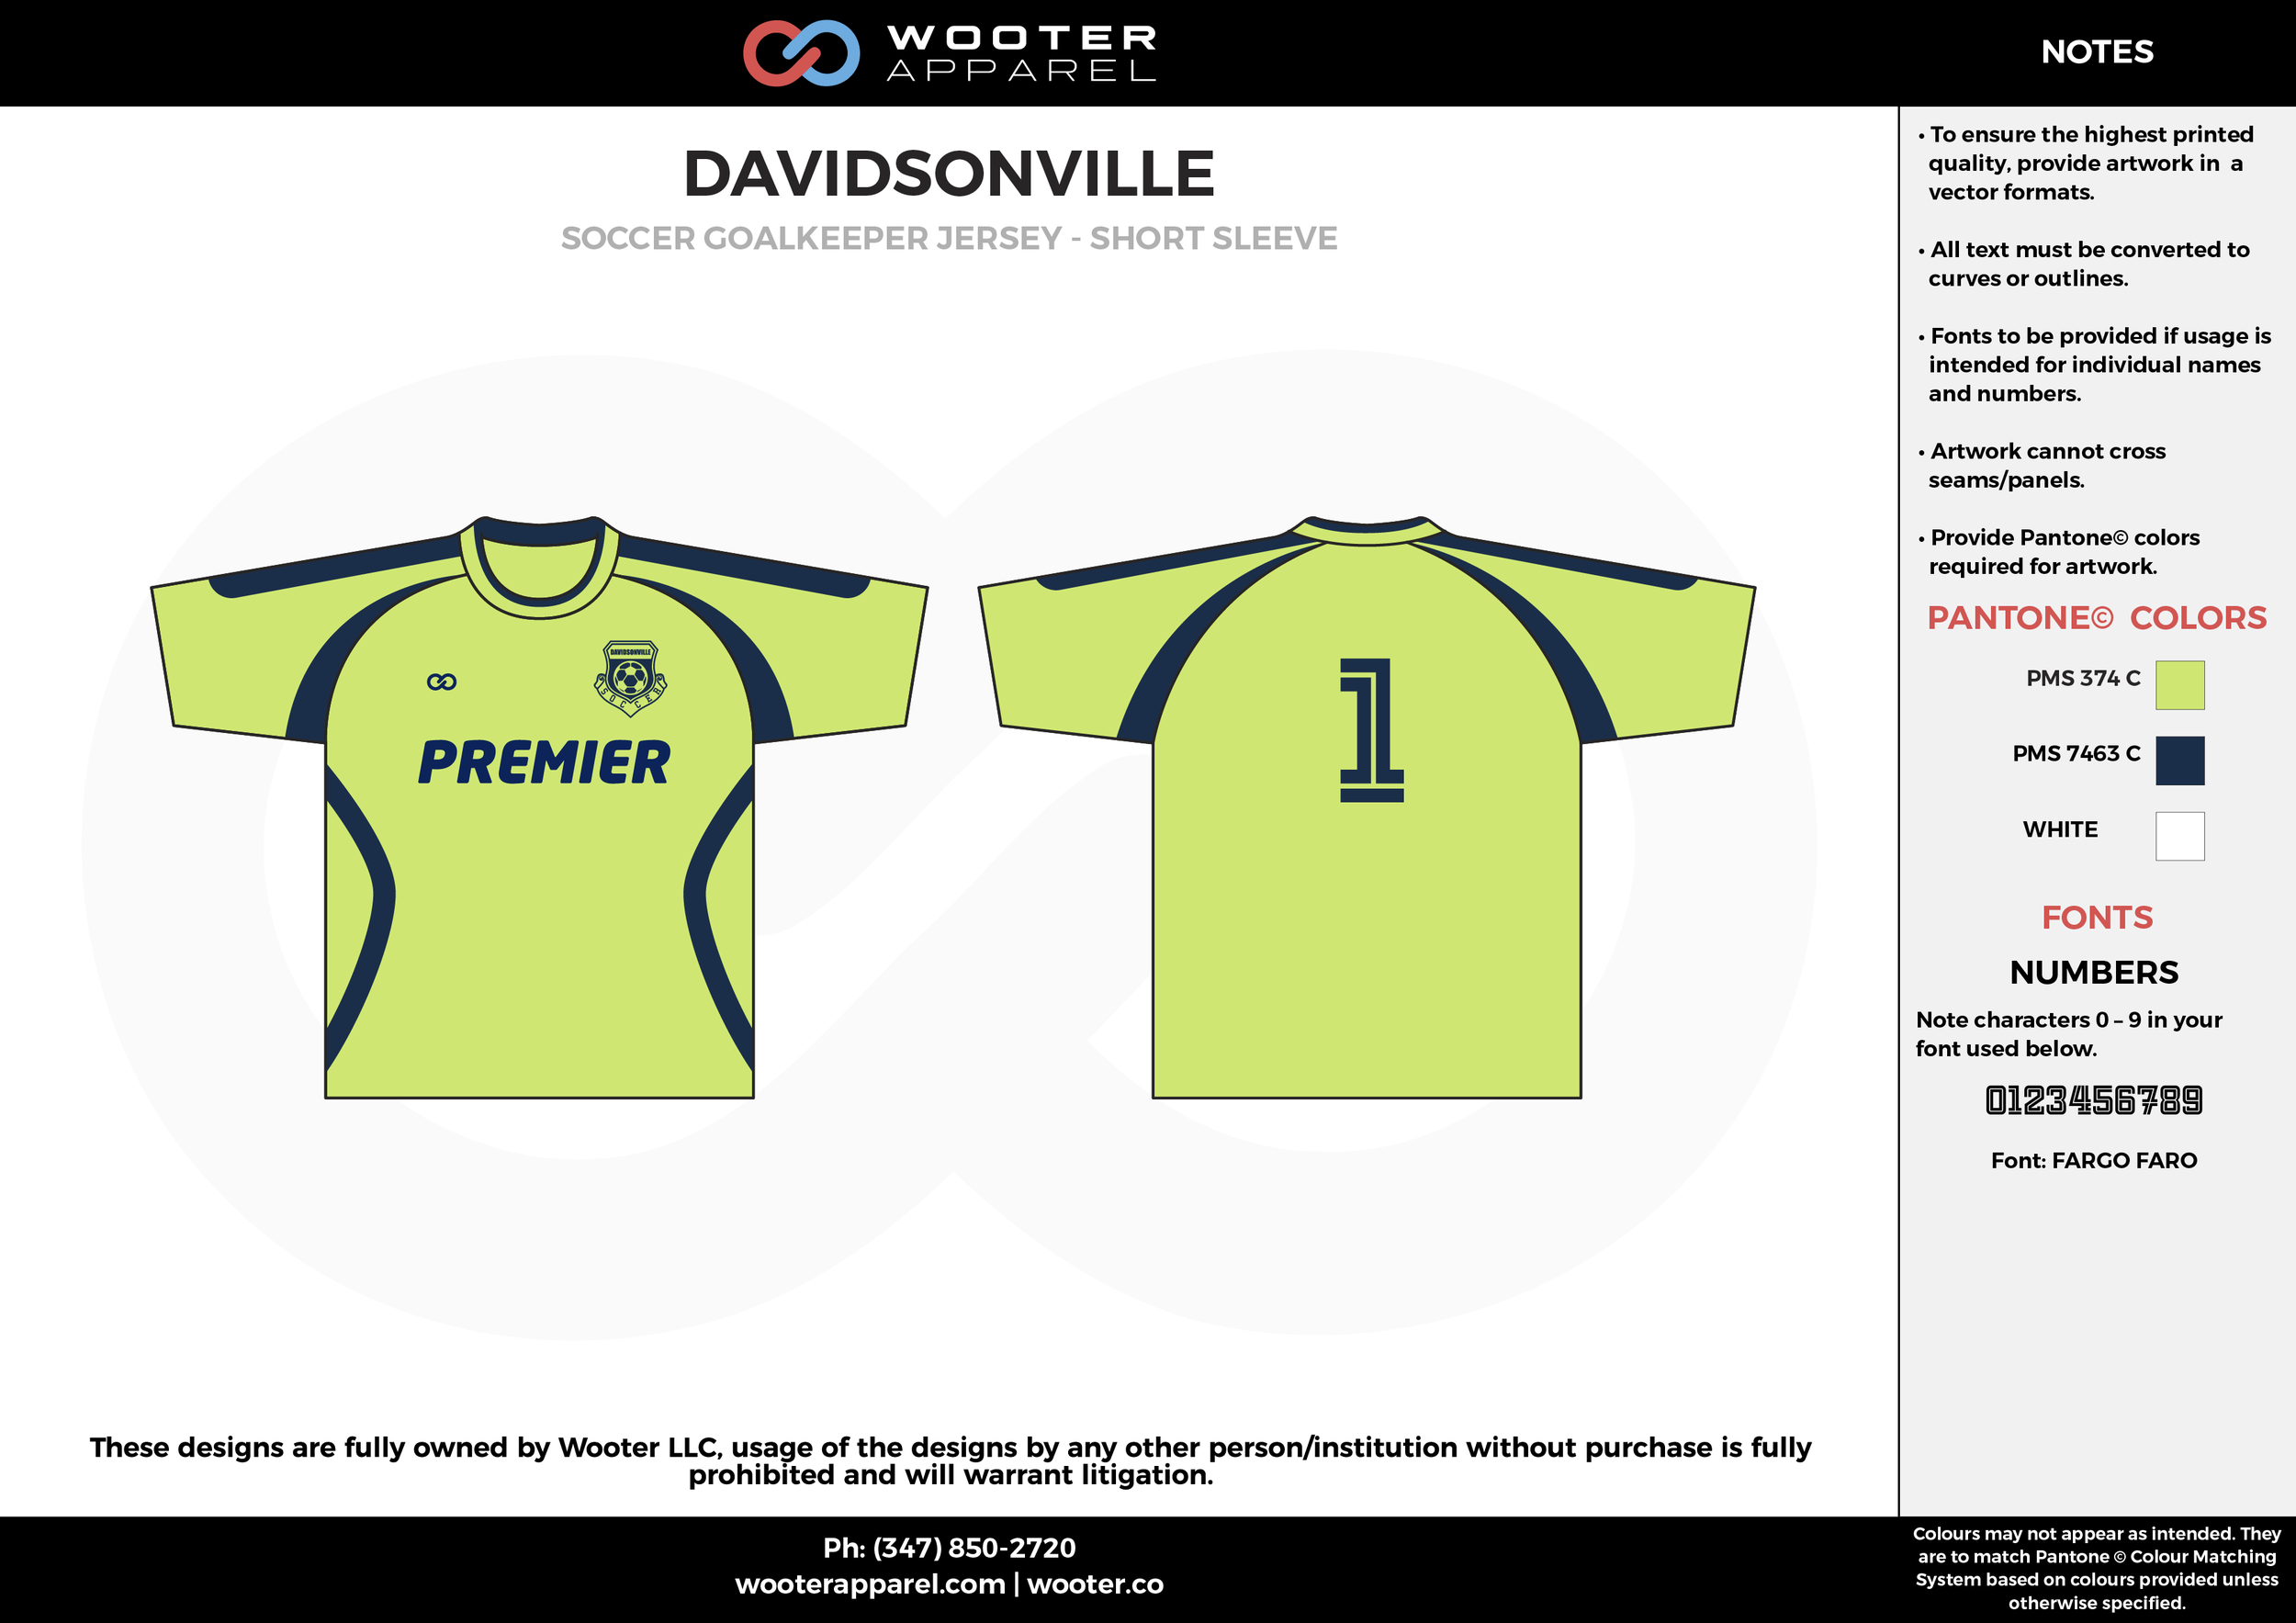 DAVIDSONVILLE apple green blue custom sublimated soccer uniform jersey shirt